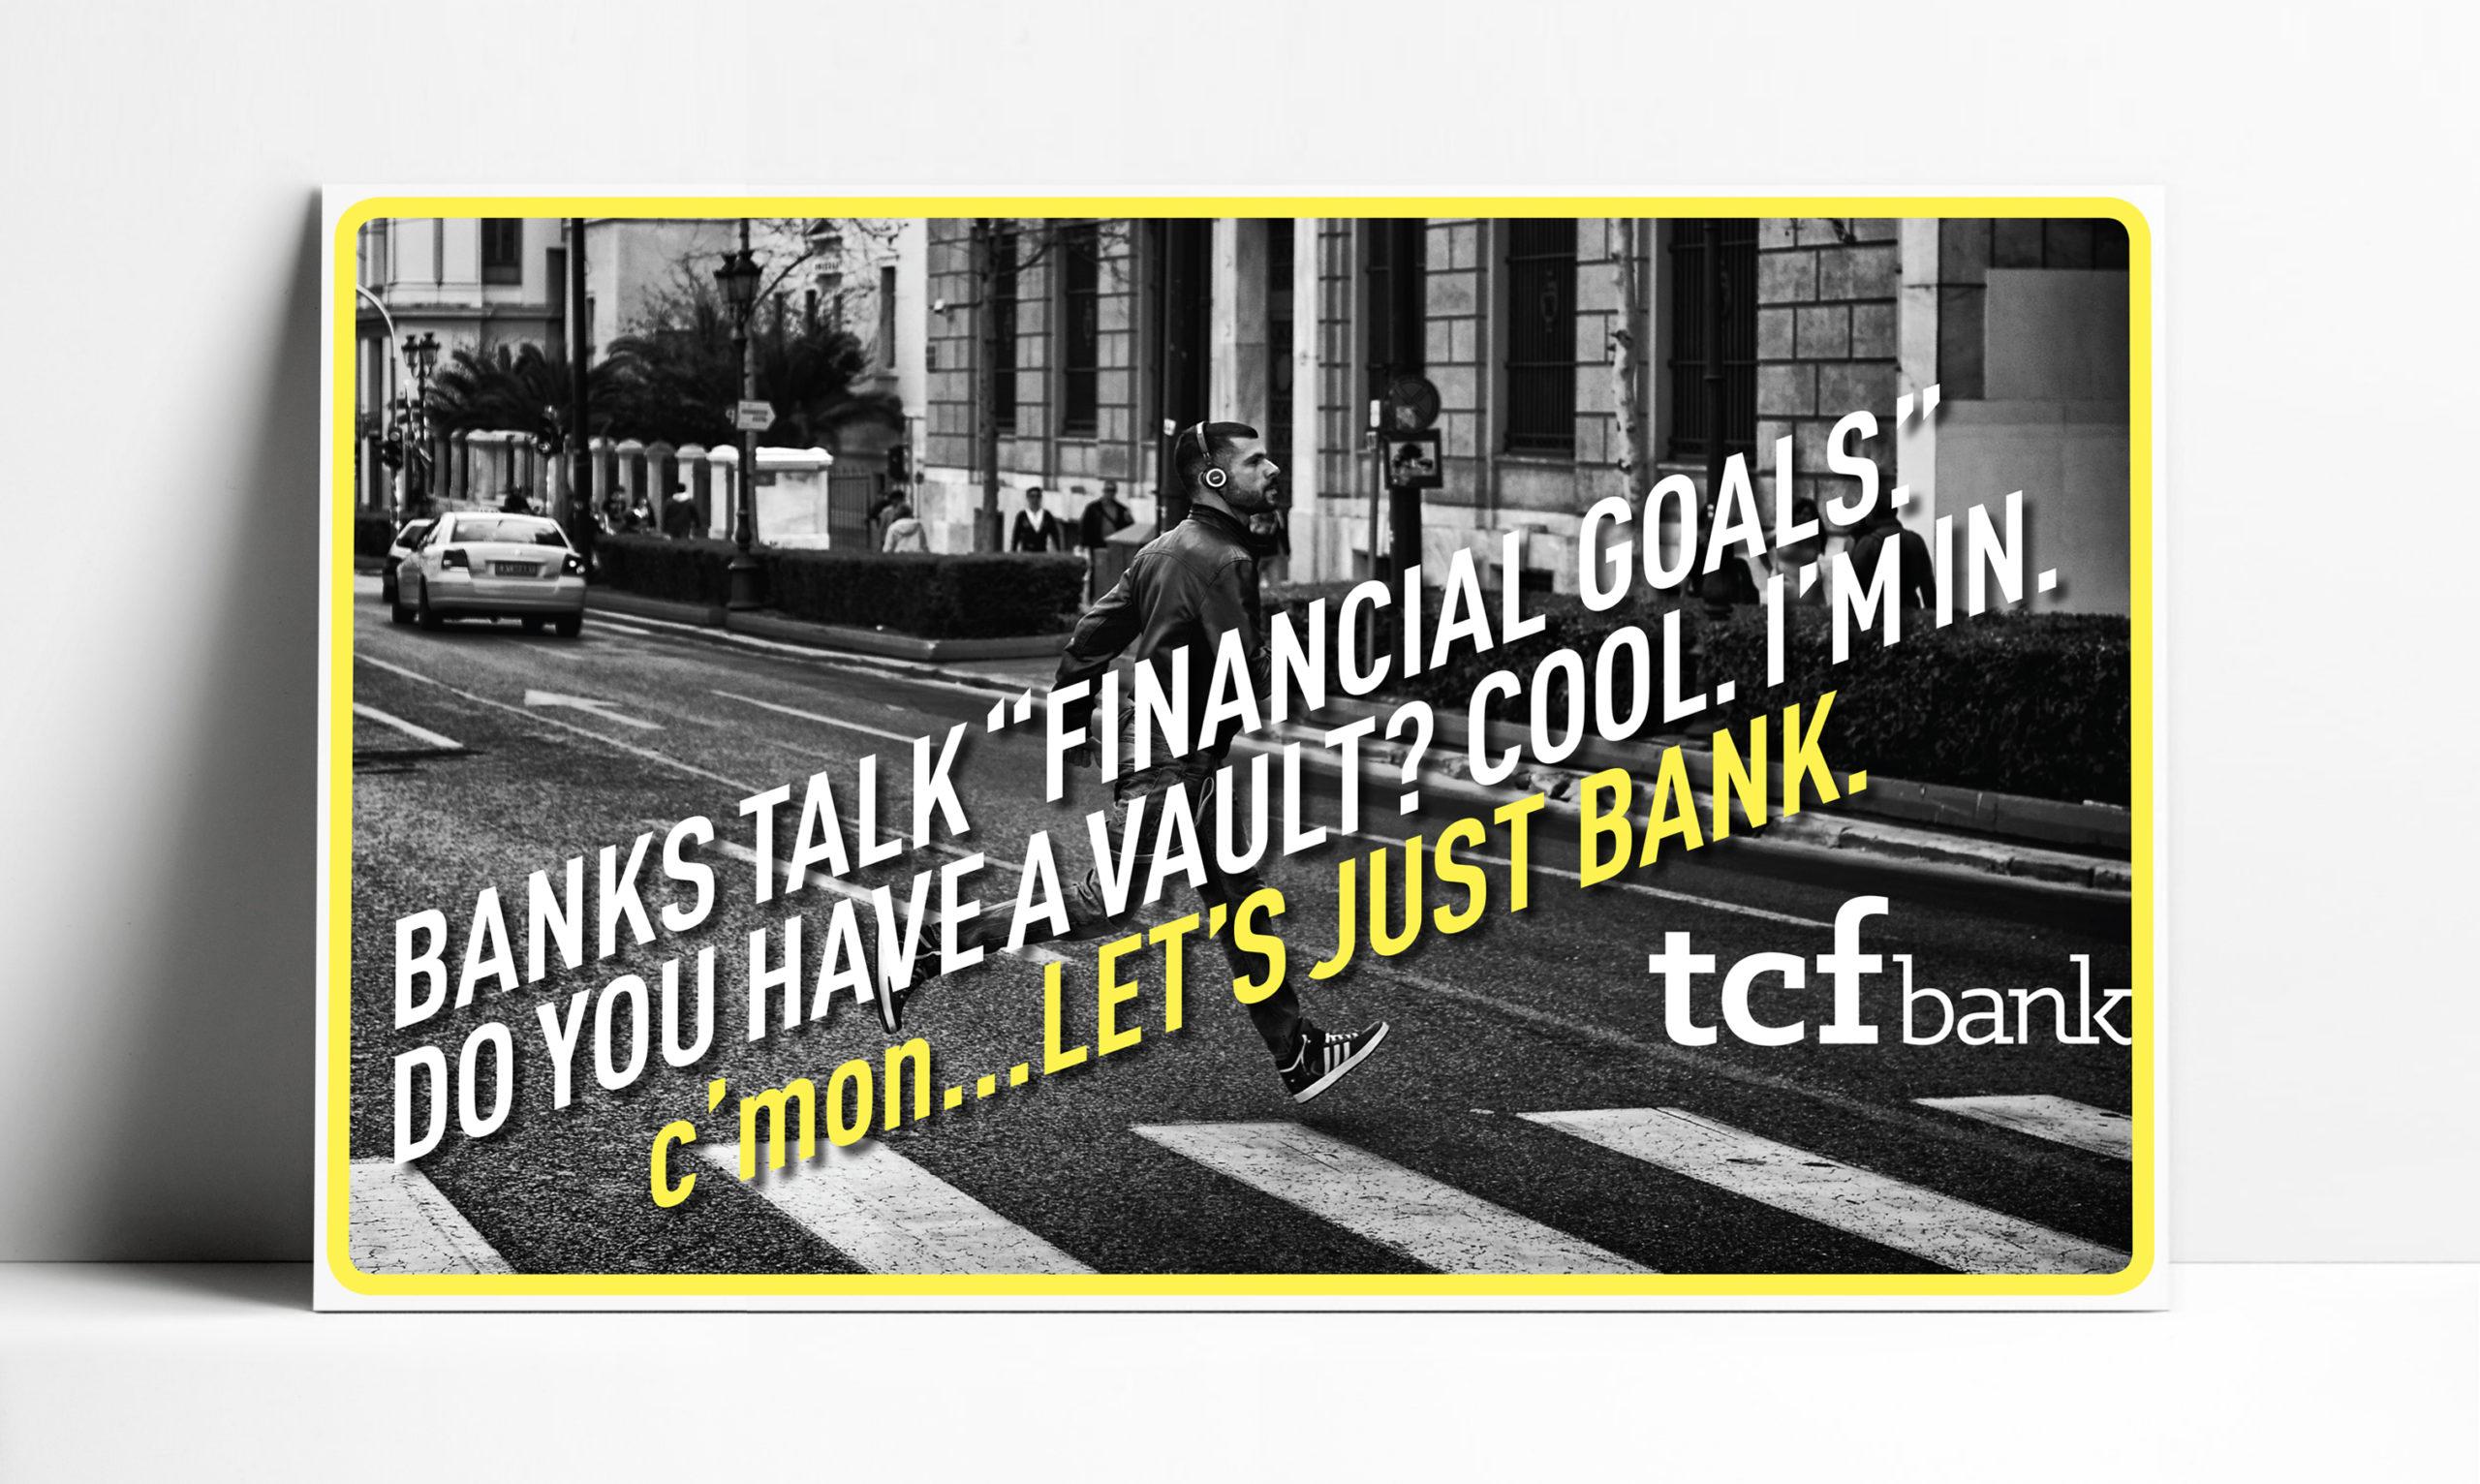 TCF_PresoAd_Cmon1